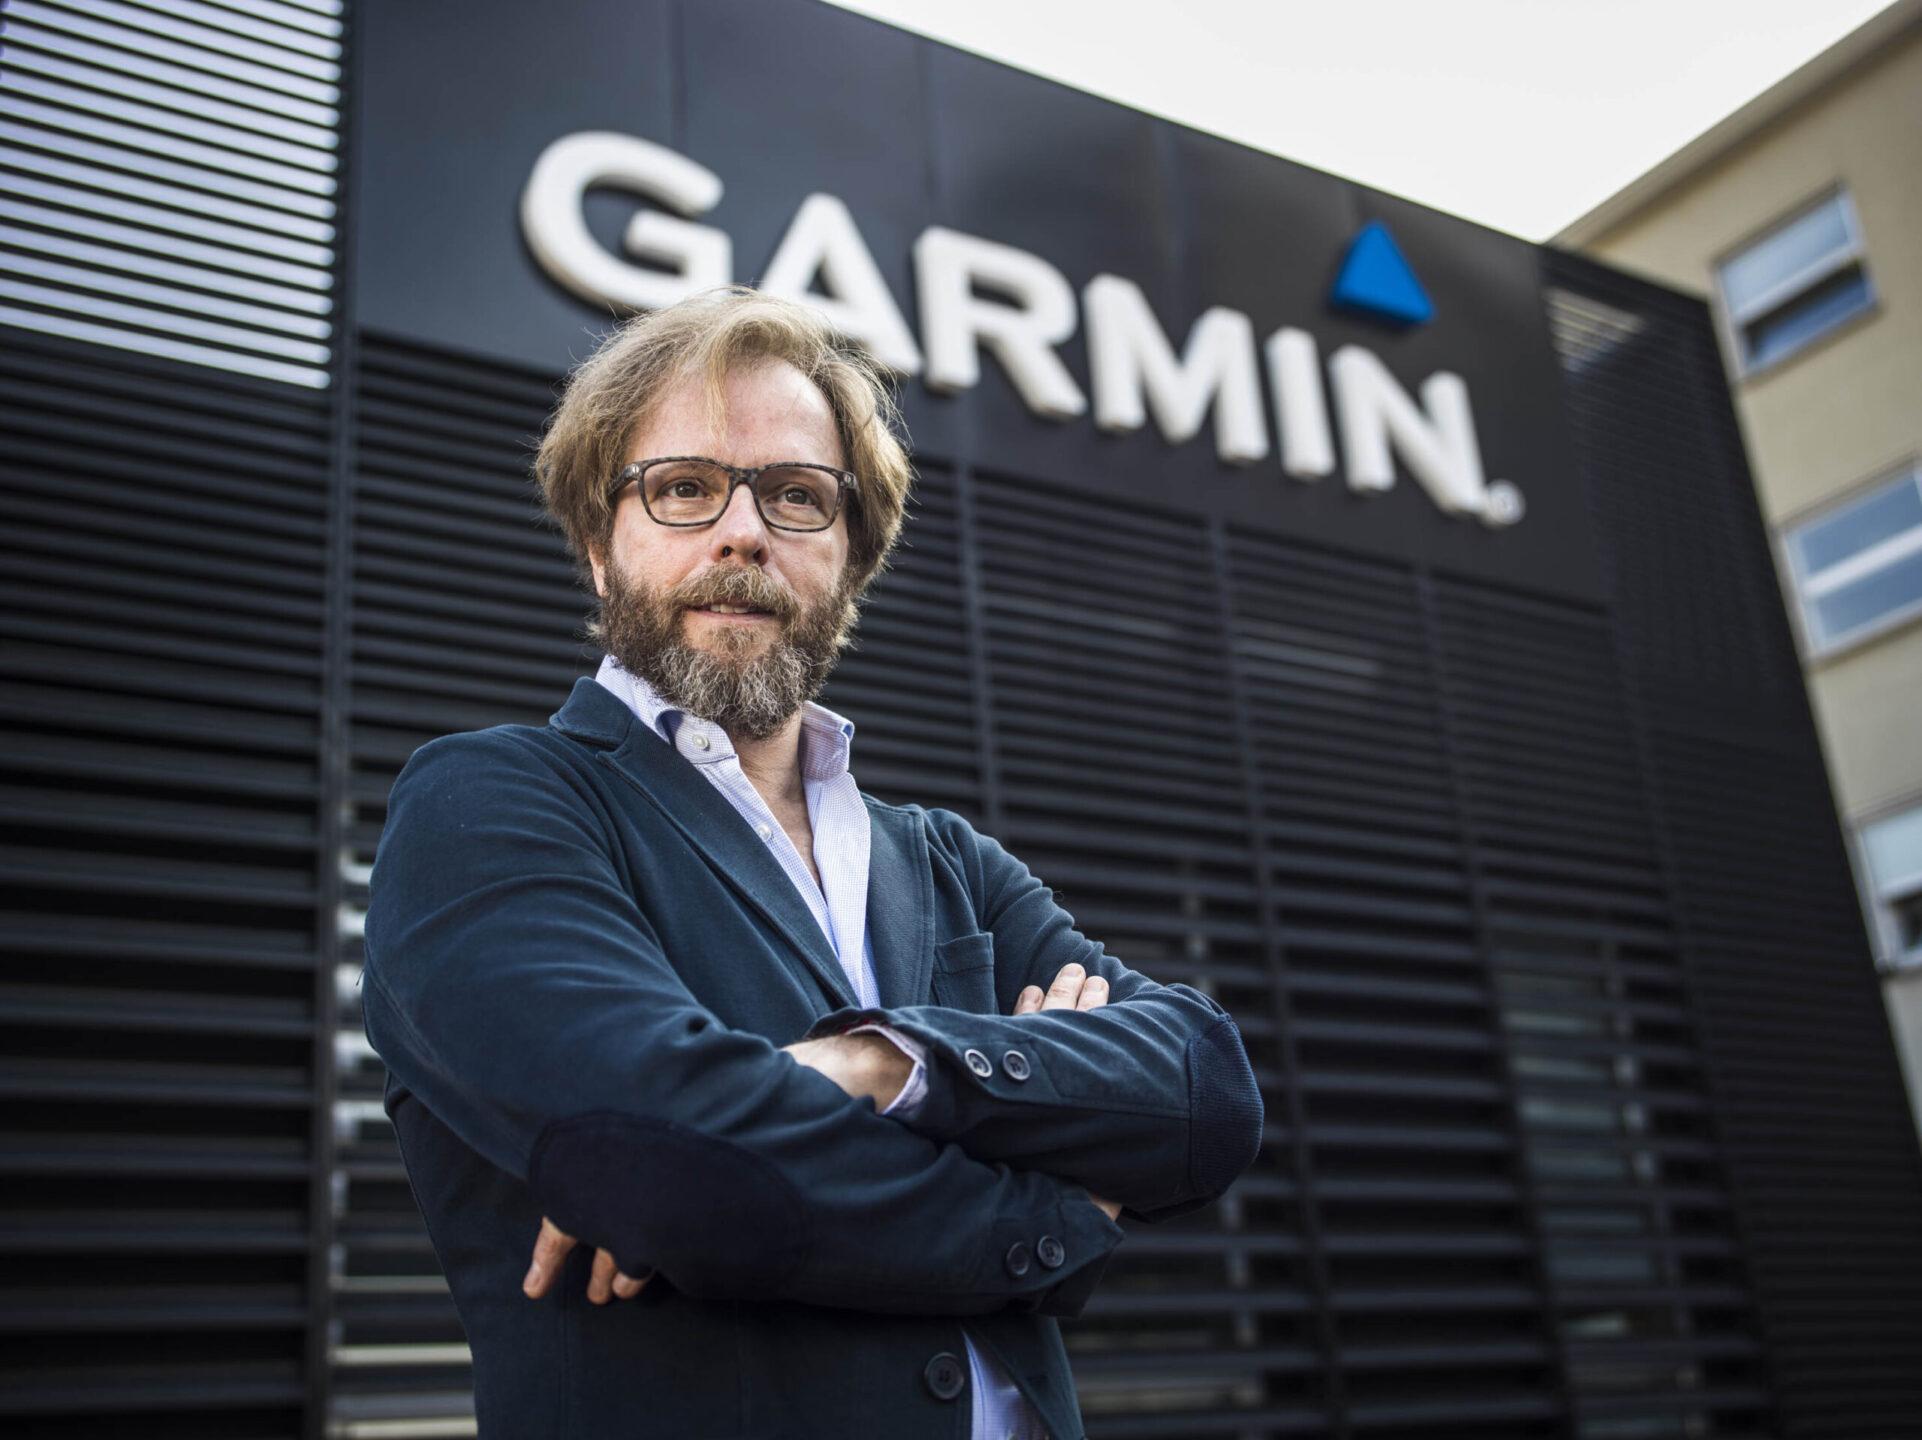 Stefano Viganò, Garmin Italia